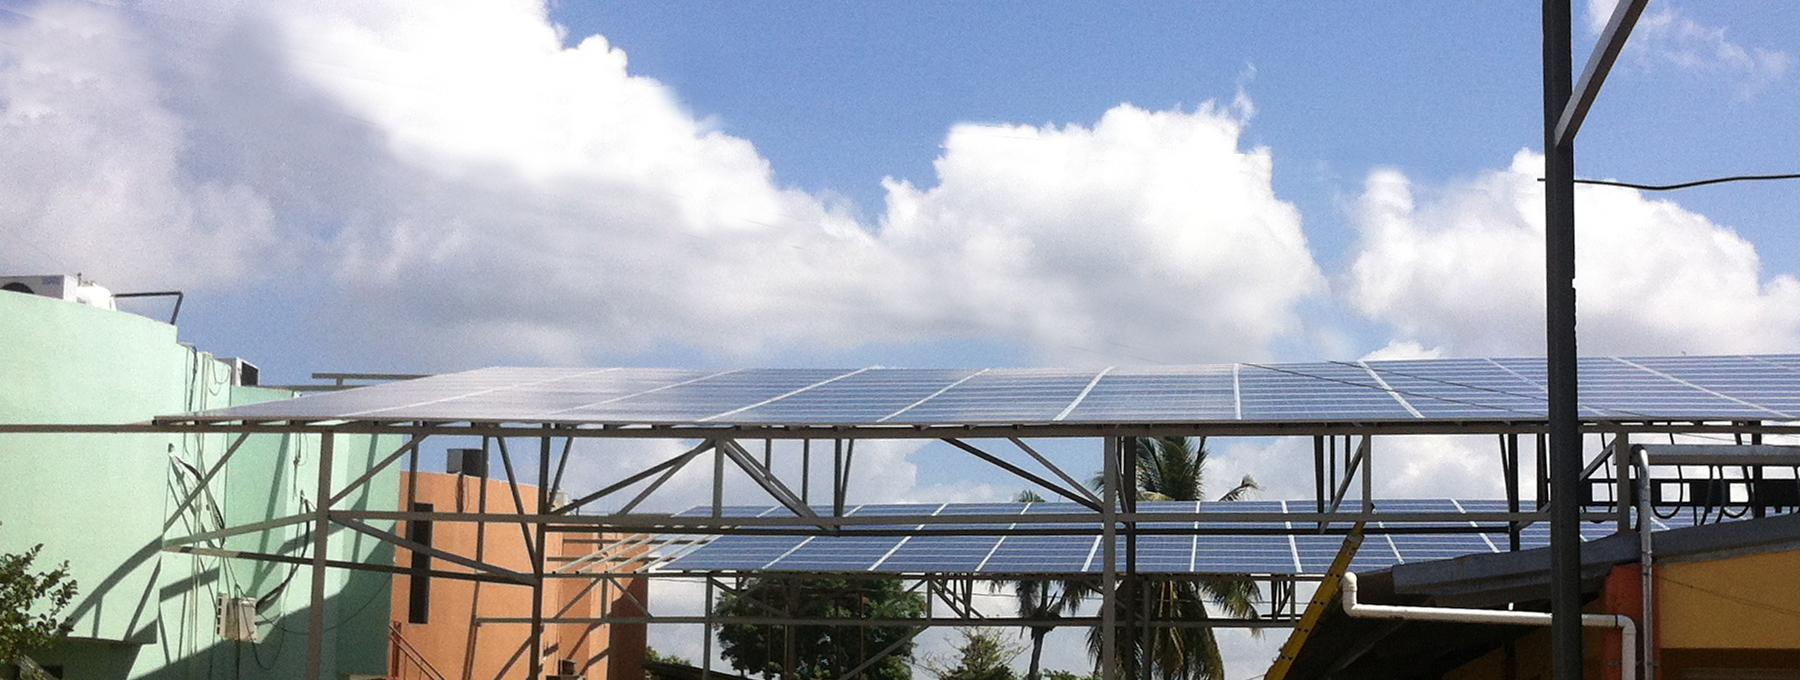 Latin America paneles solares | CivicSolar